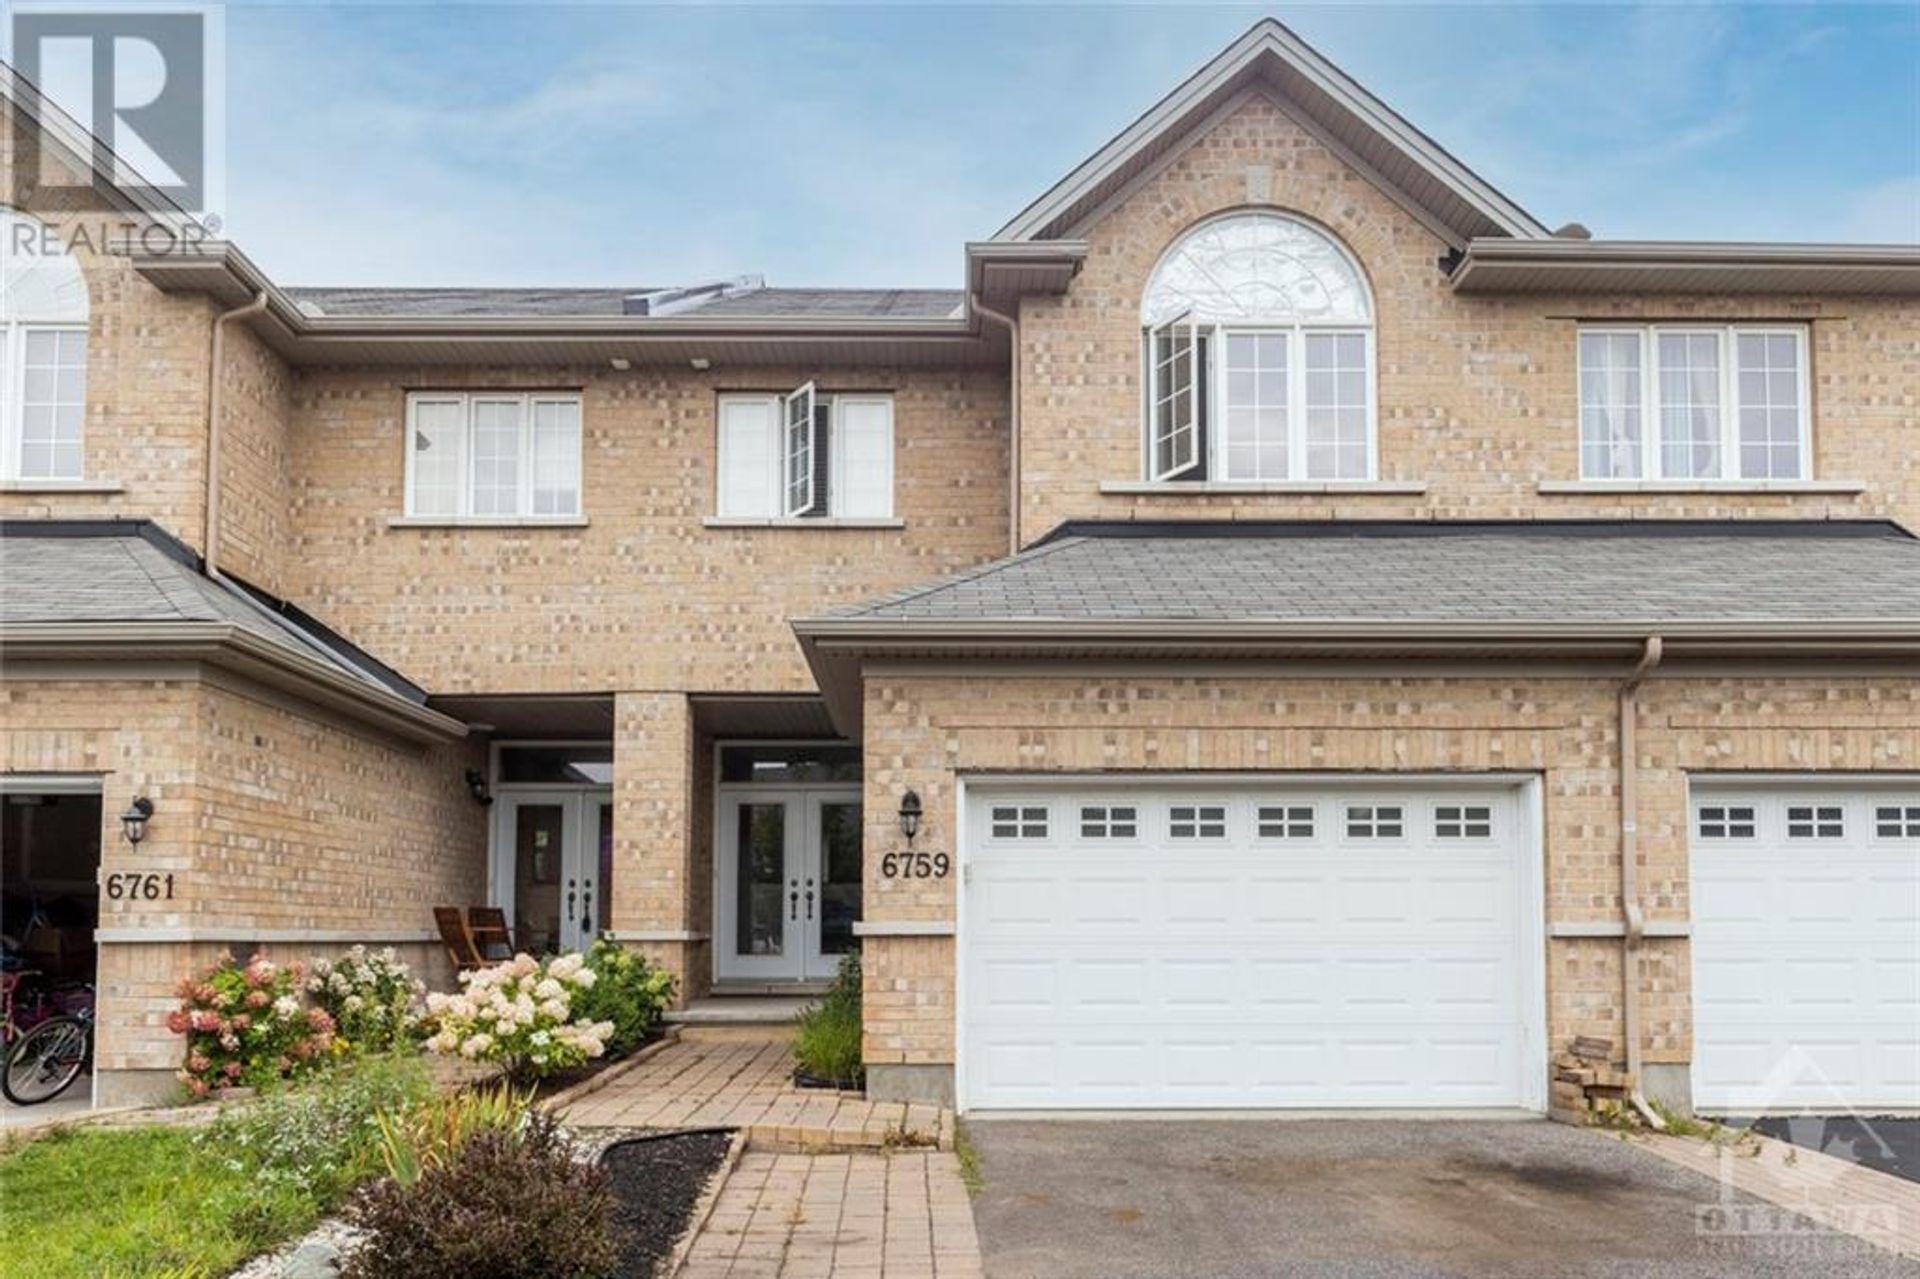 6759 Breanna Cardill Street, Greely, Ottawa